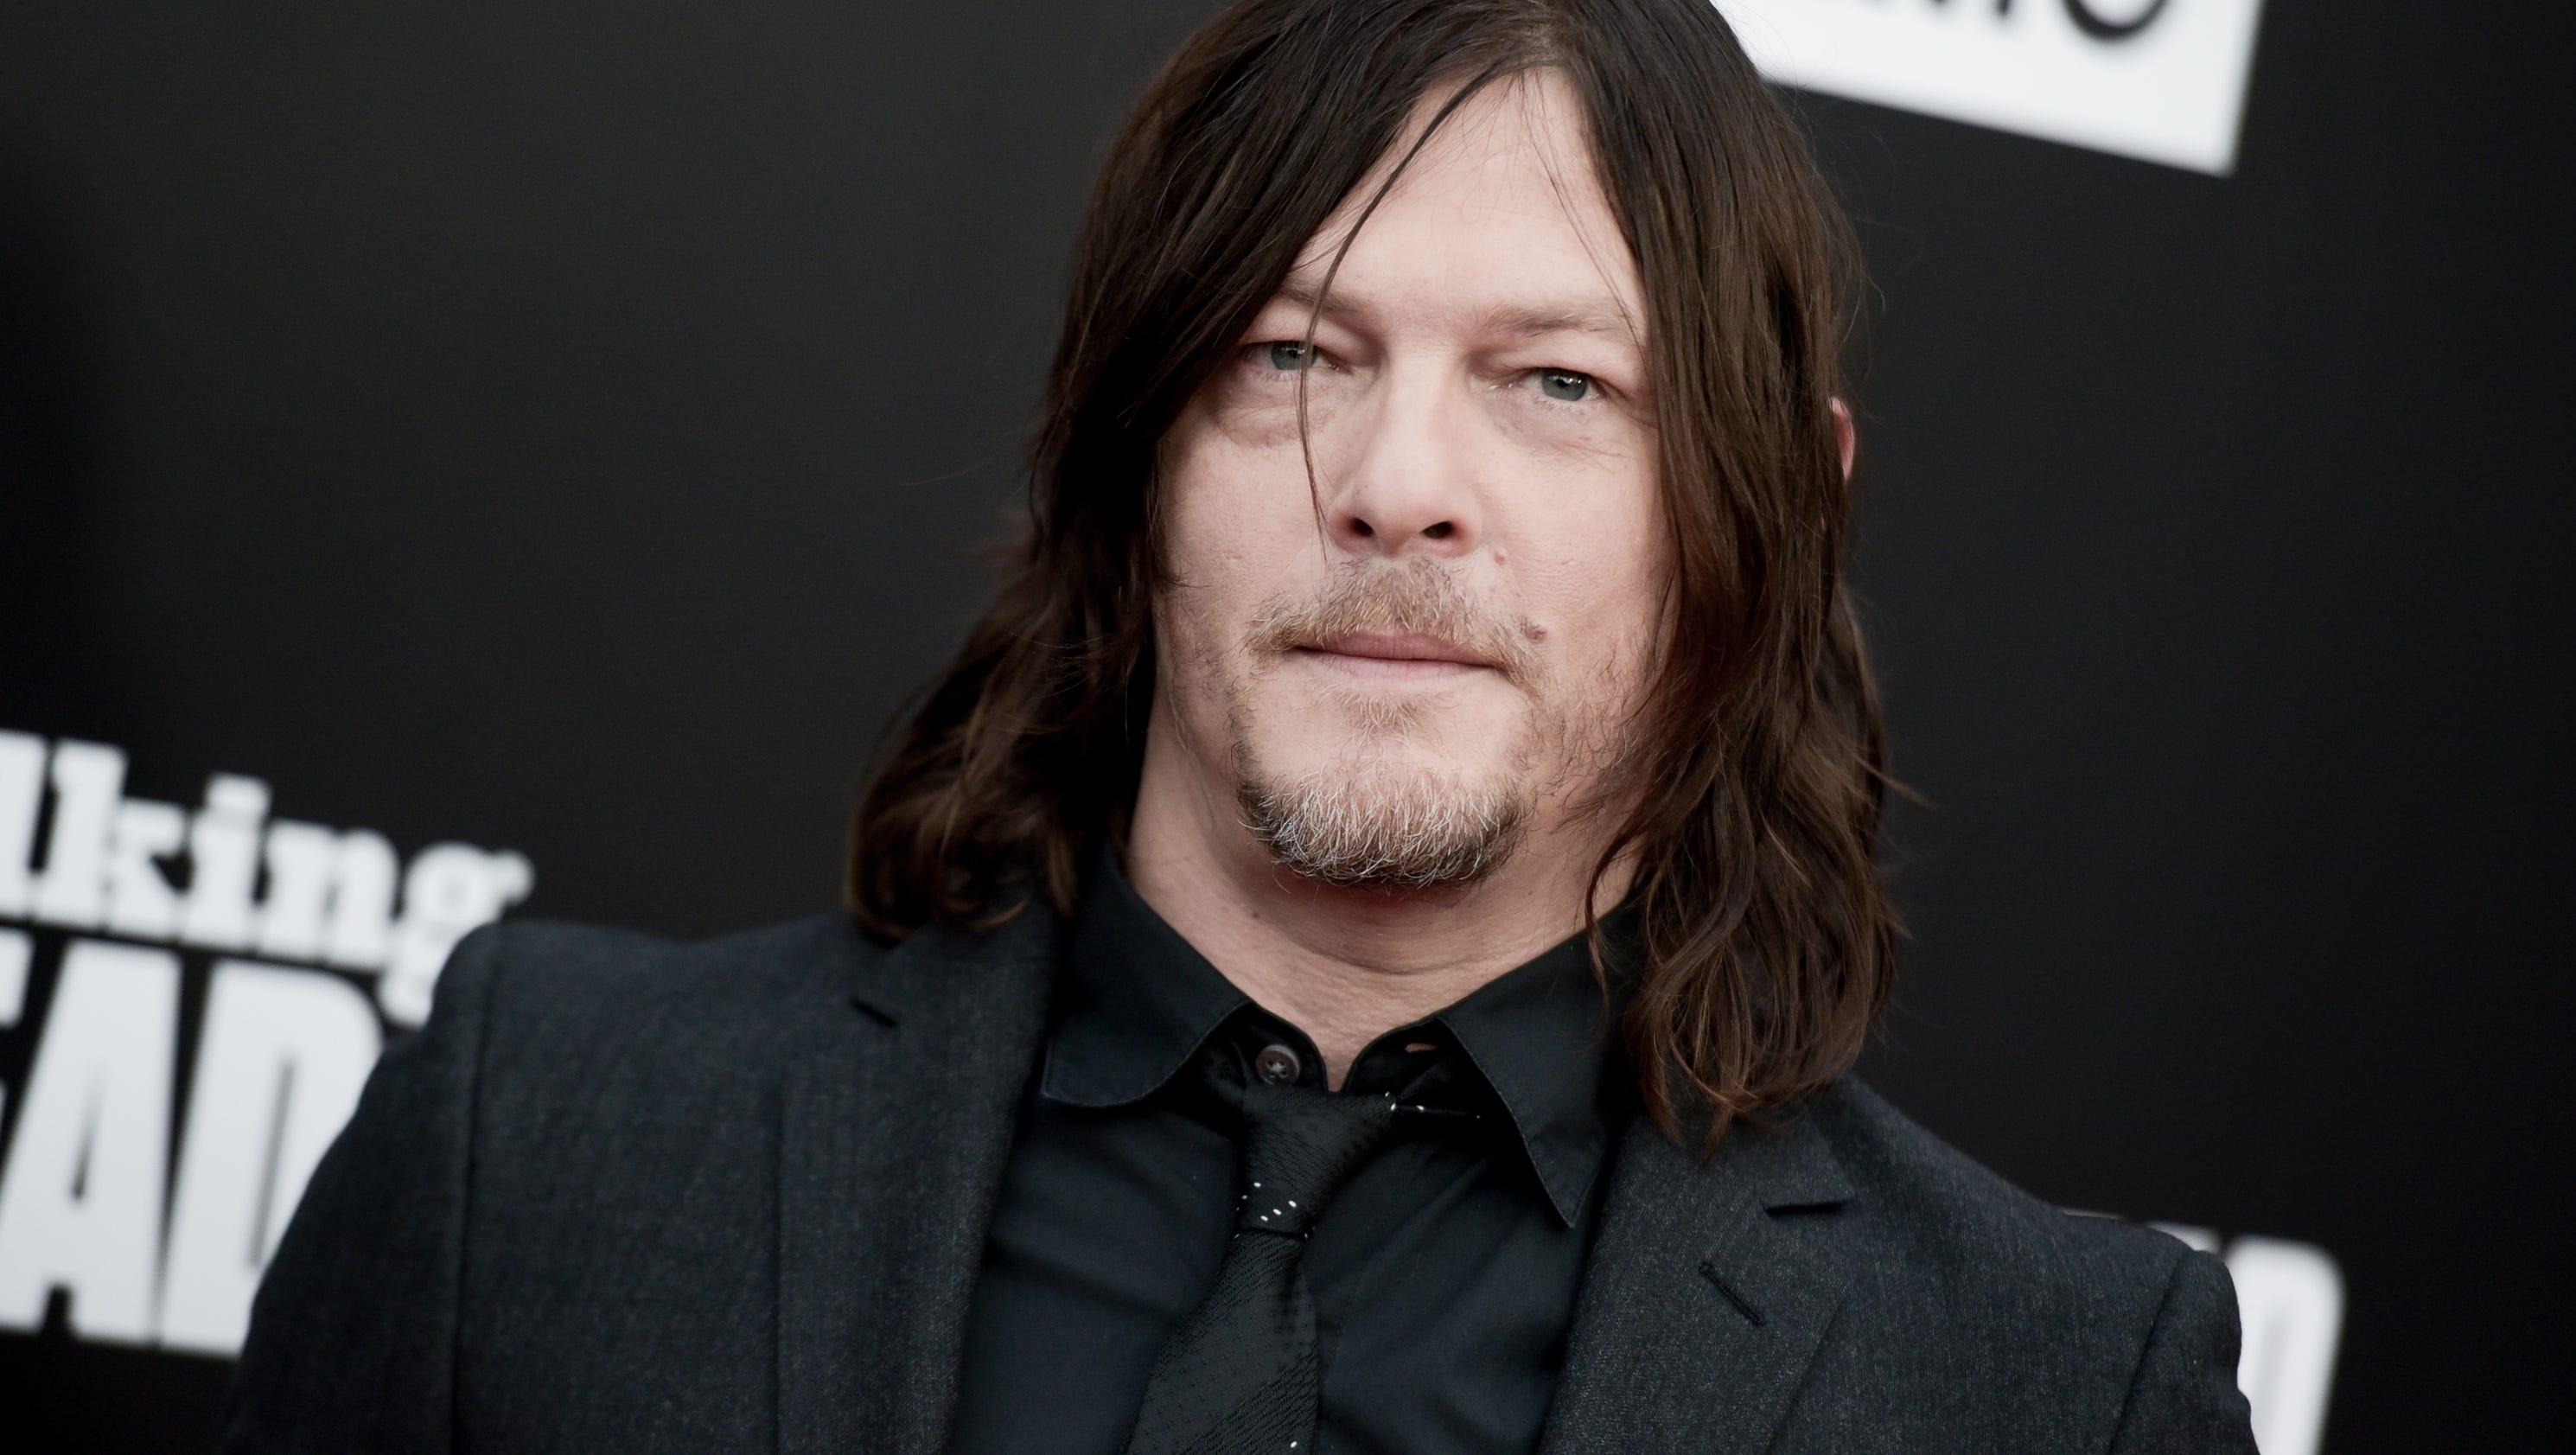 'The Walking Dead' star Norman Reedus in Palm Springs